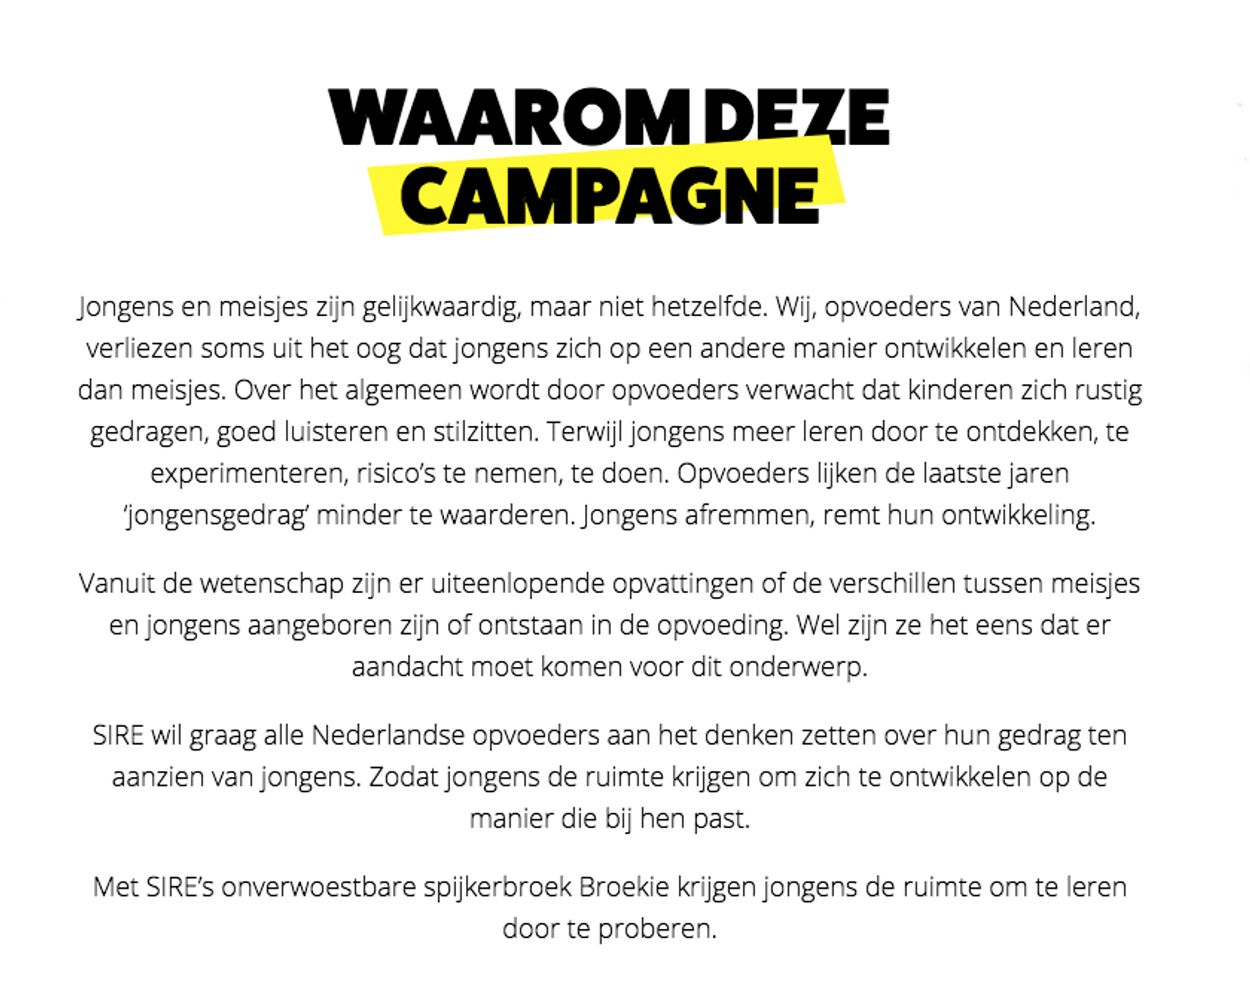 Sire: waarom de campagne?